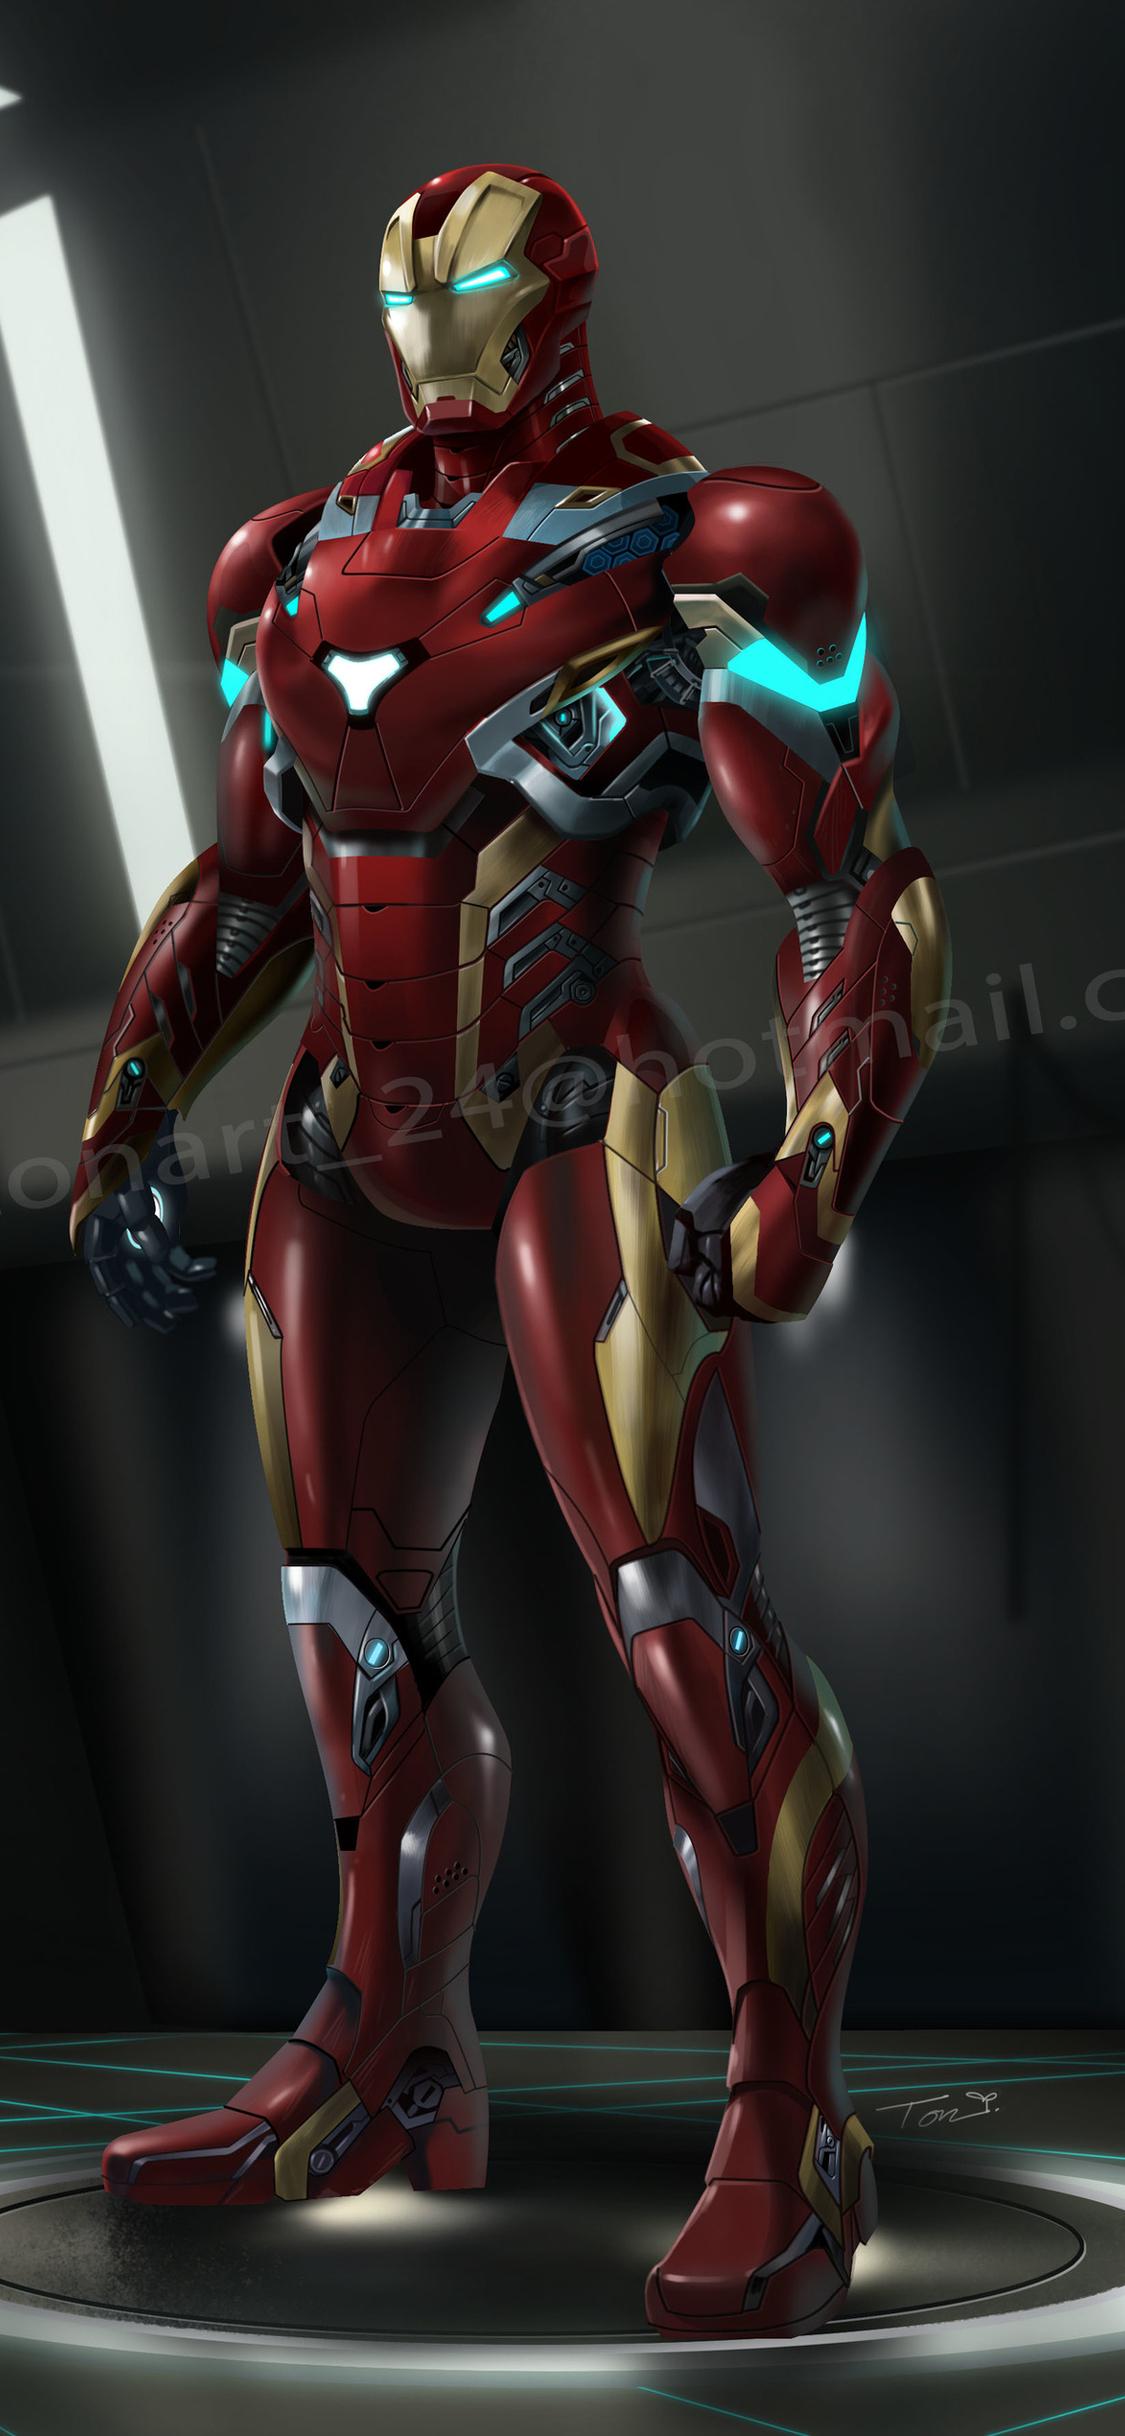 1125x2436 Iron Man Suit Artwork Iphone Xs Iphone 10 Iphone X Hd 4k